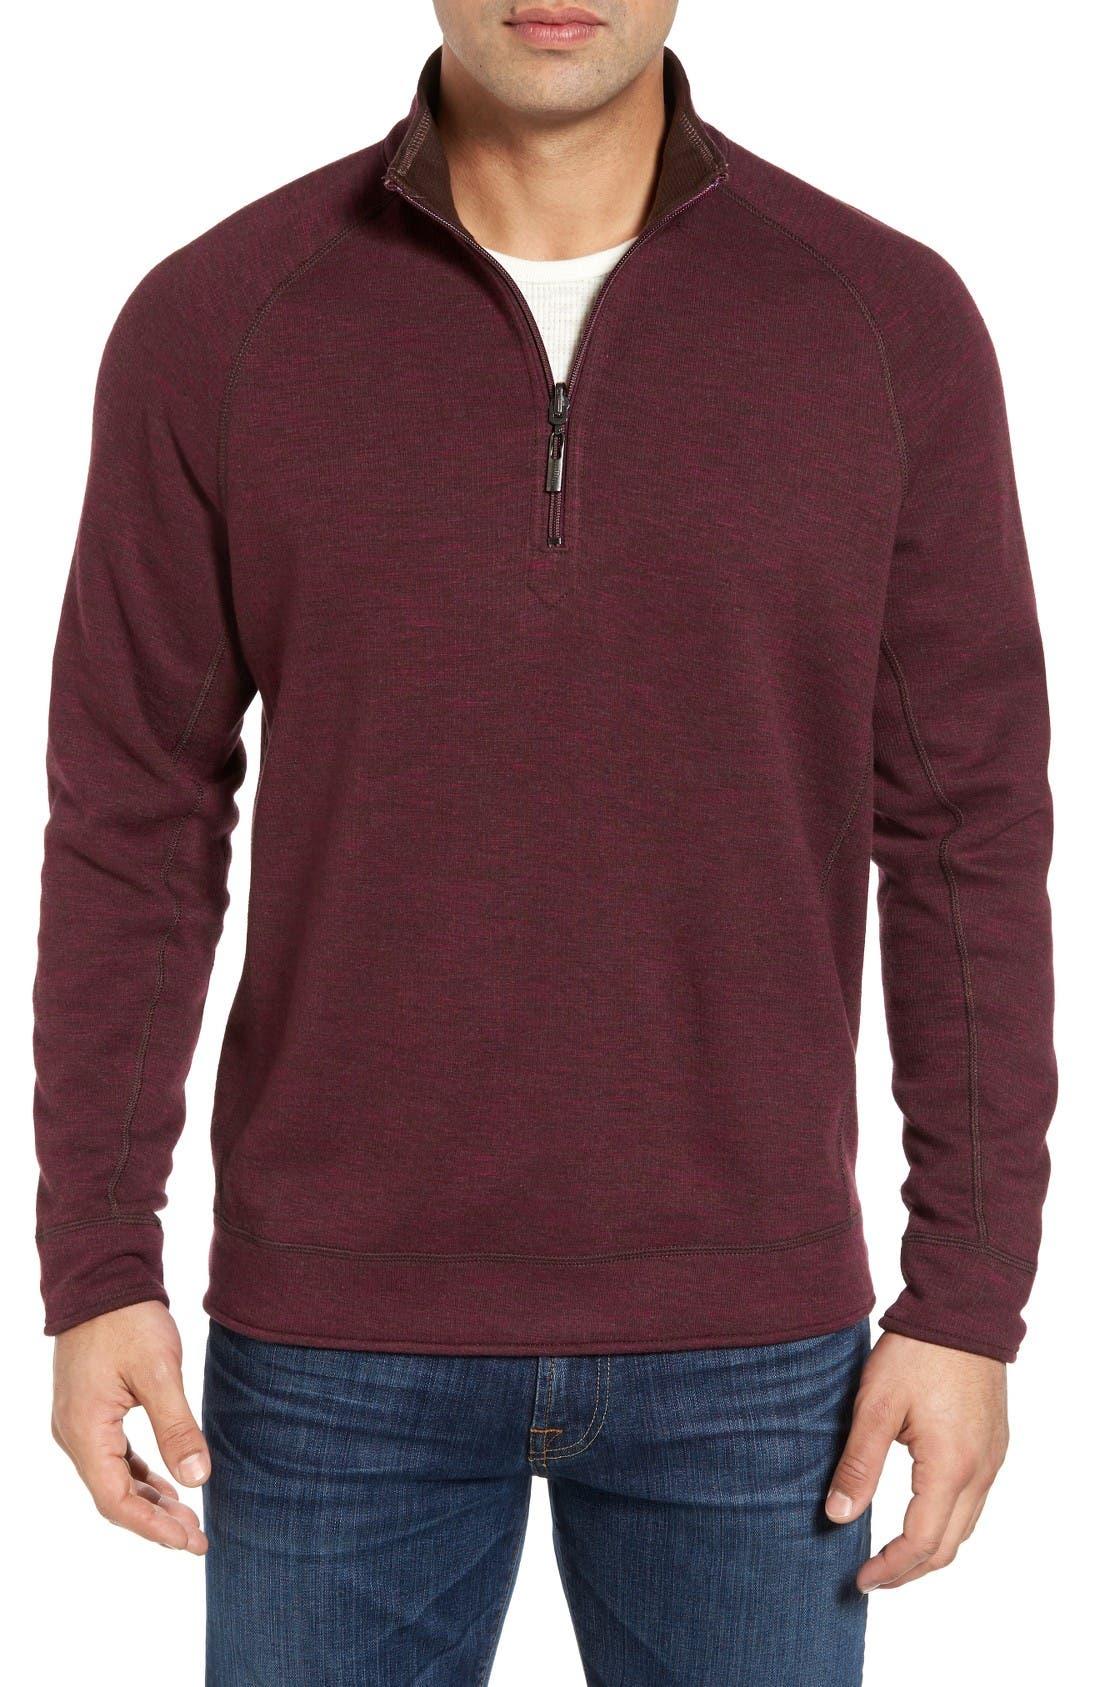 TOMMY BAHAMA Slubtropics Reversible Half Zip Pullover